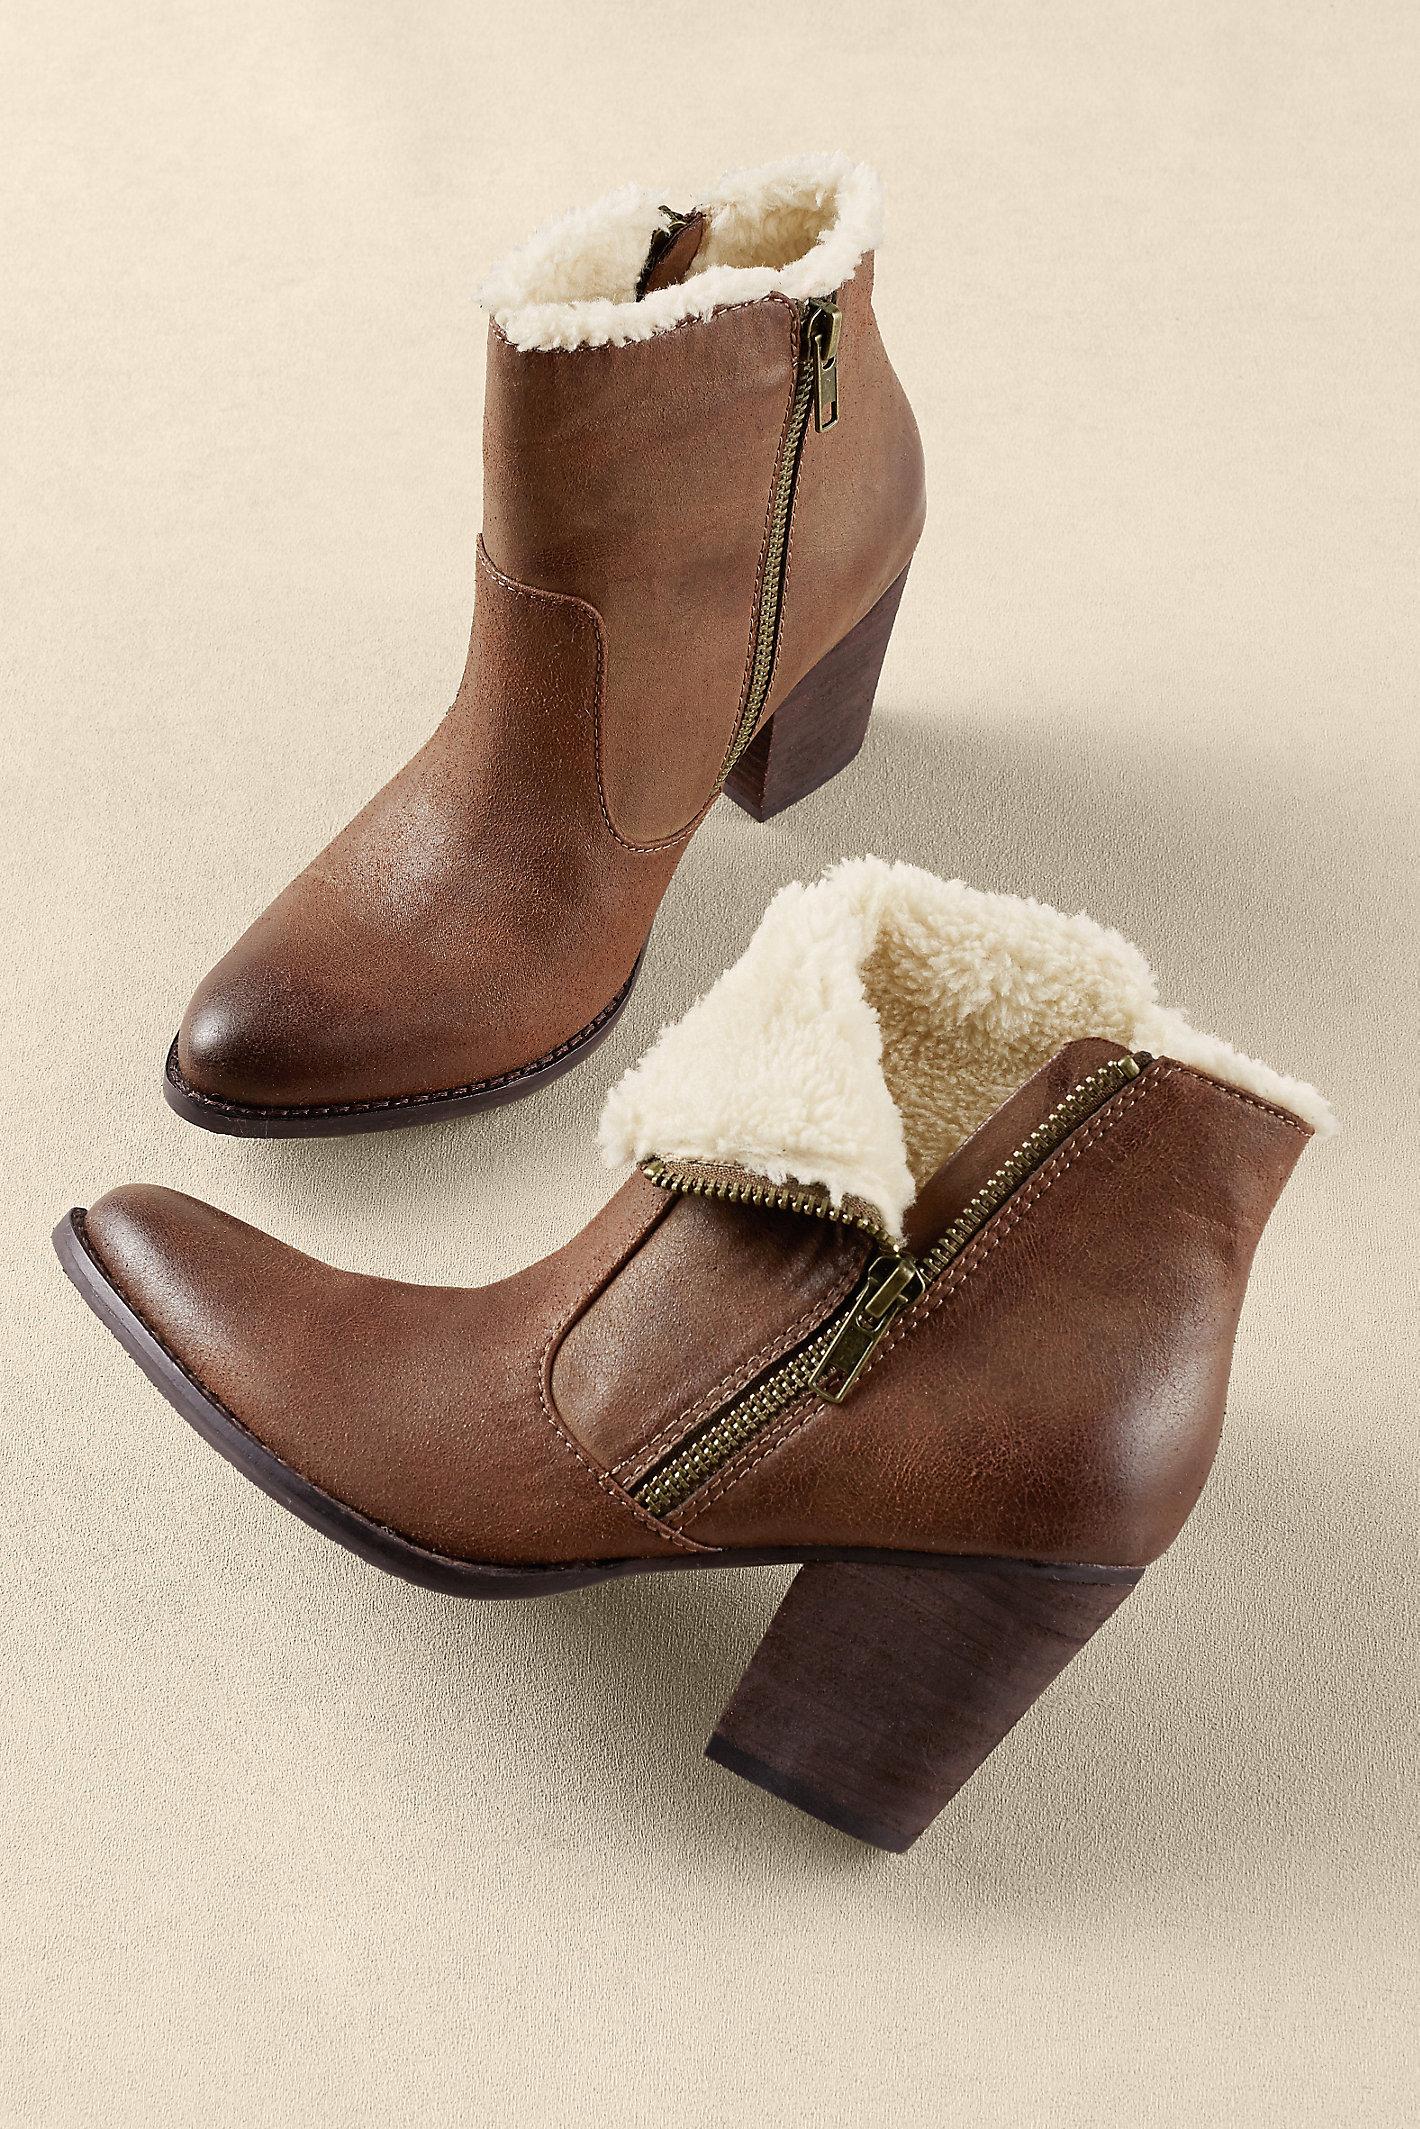 Bozeman Boots